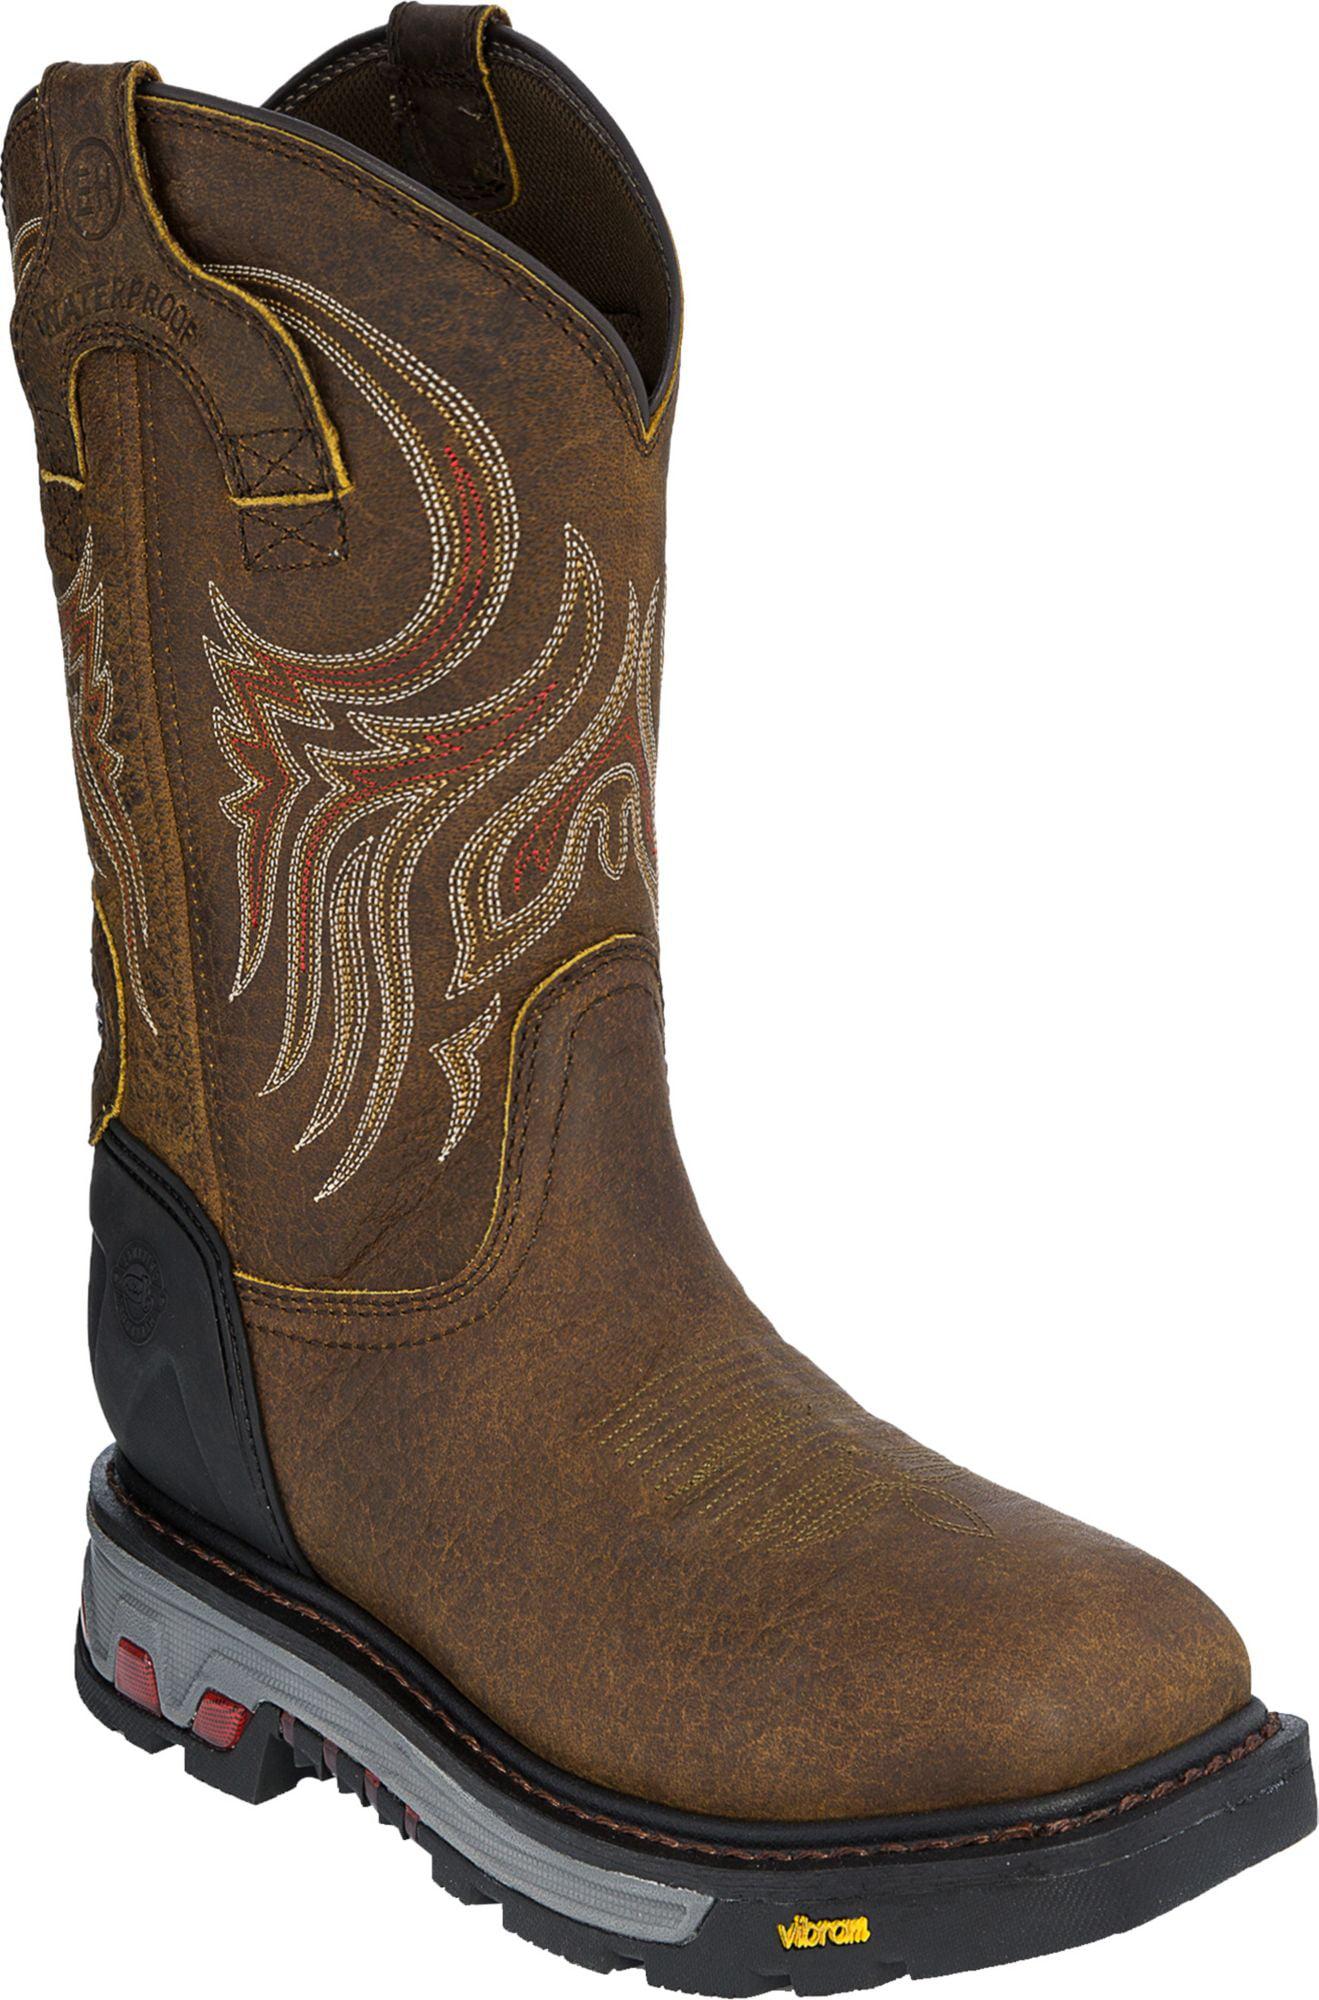 Waterproof Western Work Boots - Walmart